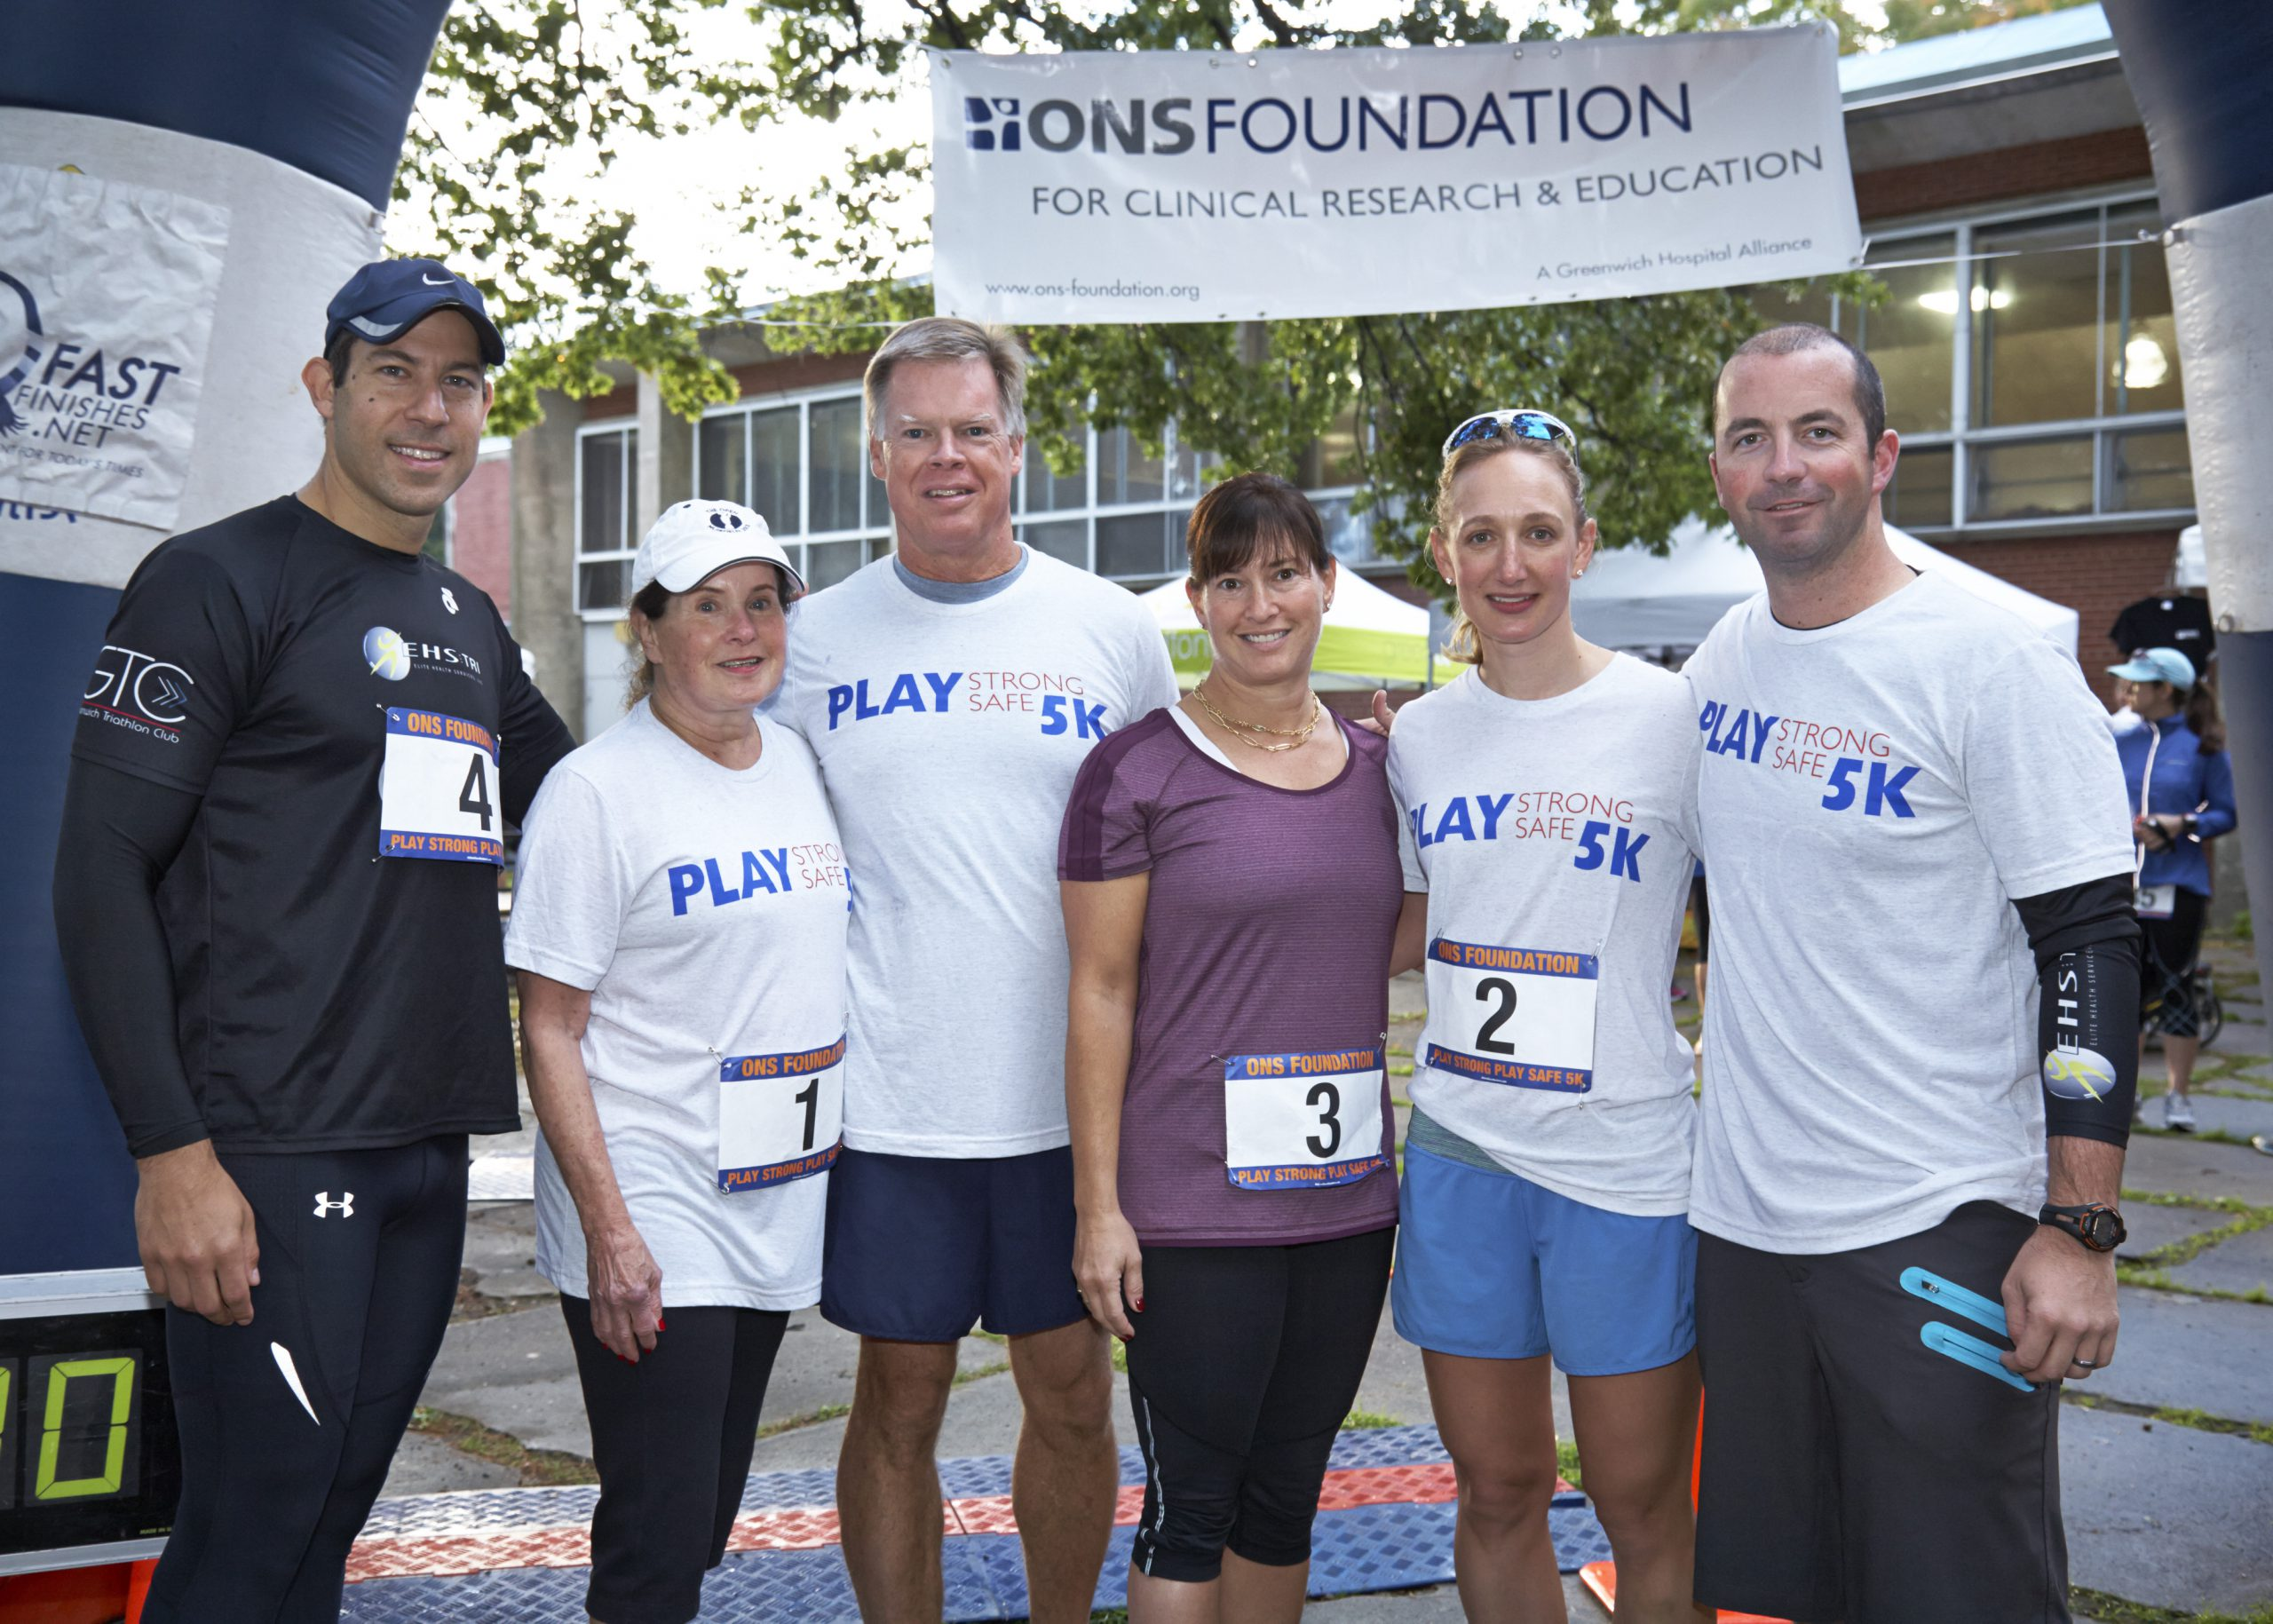 5K Committee L to R:<br>  Brad Gilden, DPT, Vicki Tananbaum,<br>Casey McKee, Co-Chair, Brenda Tananbaum, <br>Katie Vadasdi, MD, Co-Chair and Jon Stellwagen<br />